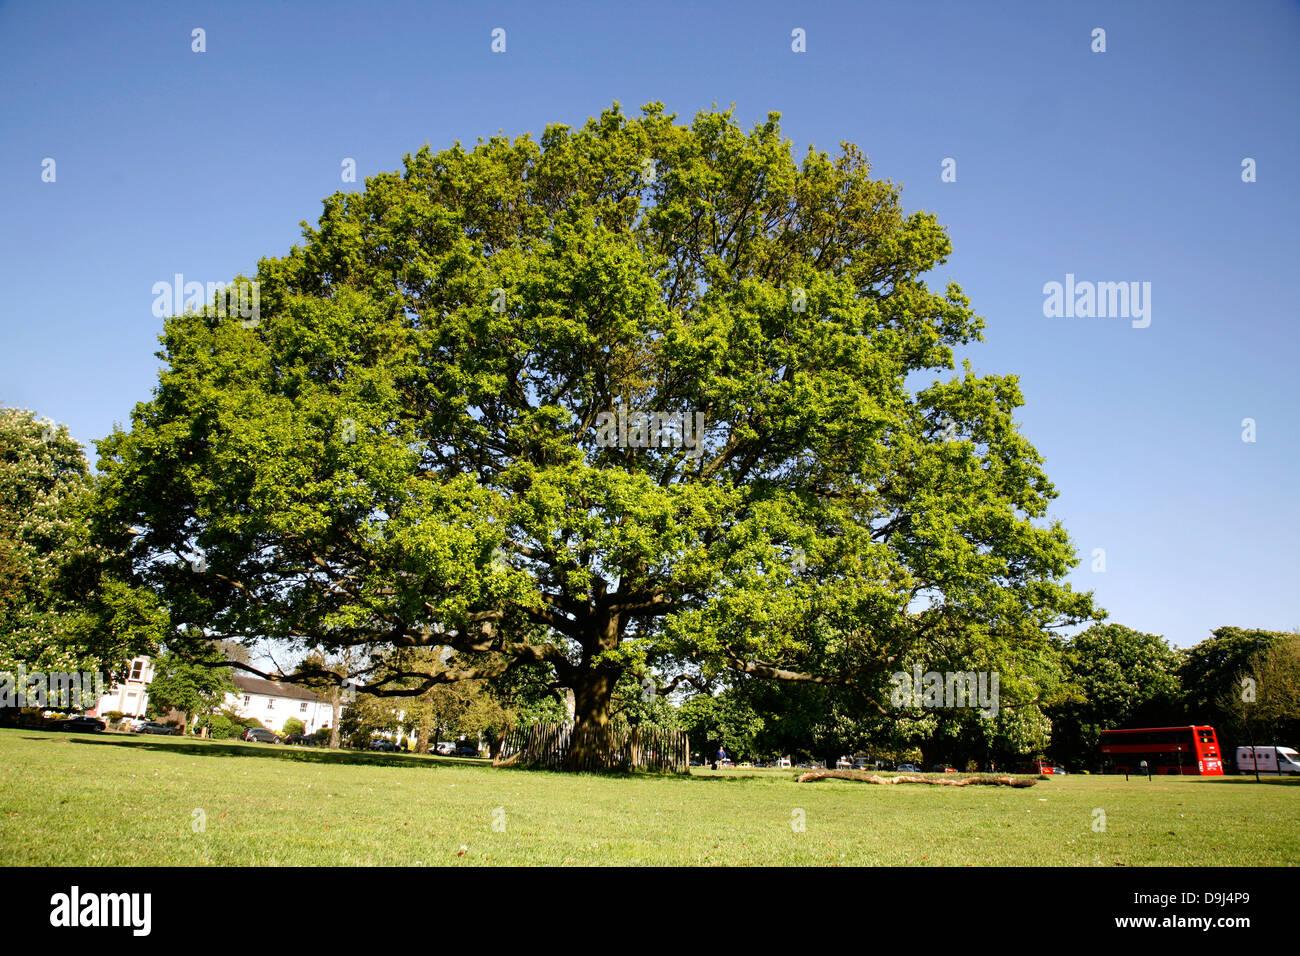 Oak tree on Ealing Common, Ealing, London, UK - Stock Image